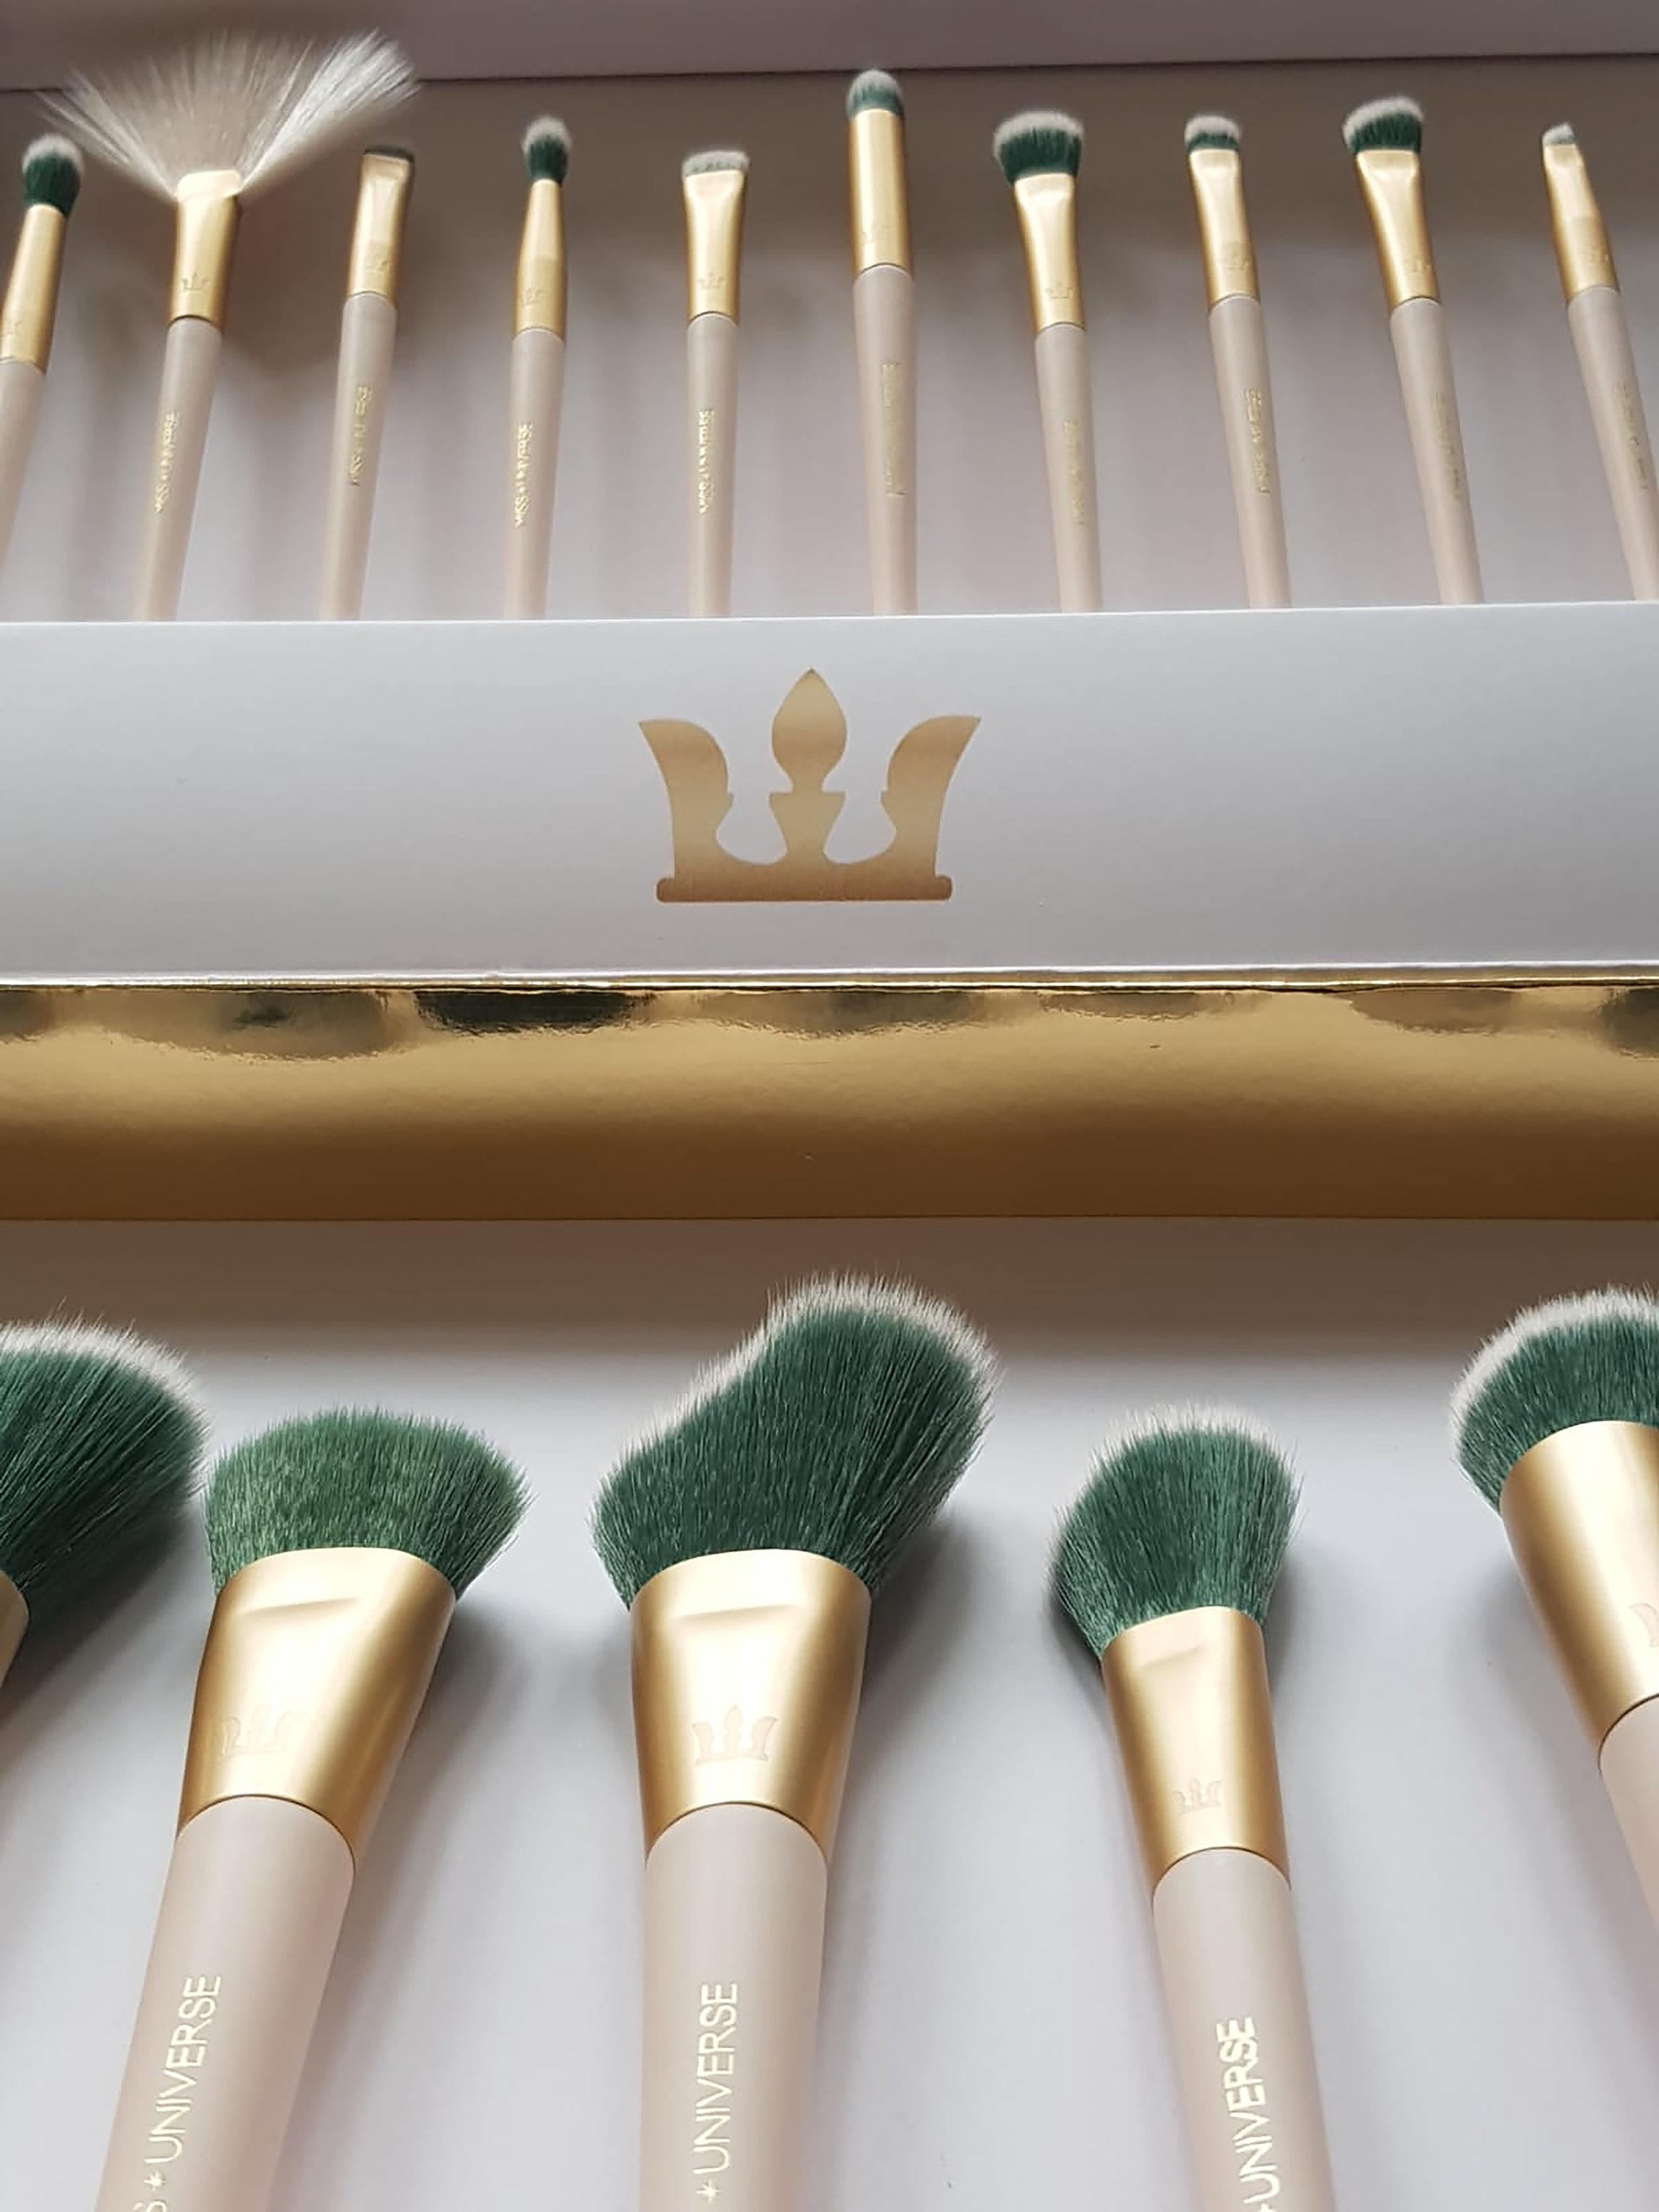 SMAK-Miss Universe Ireland-Brushes-6.jpg